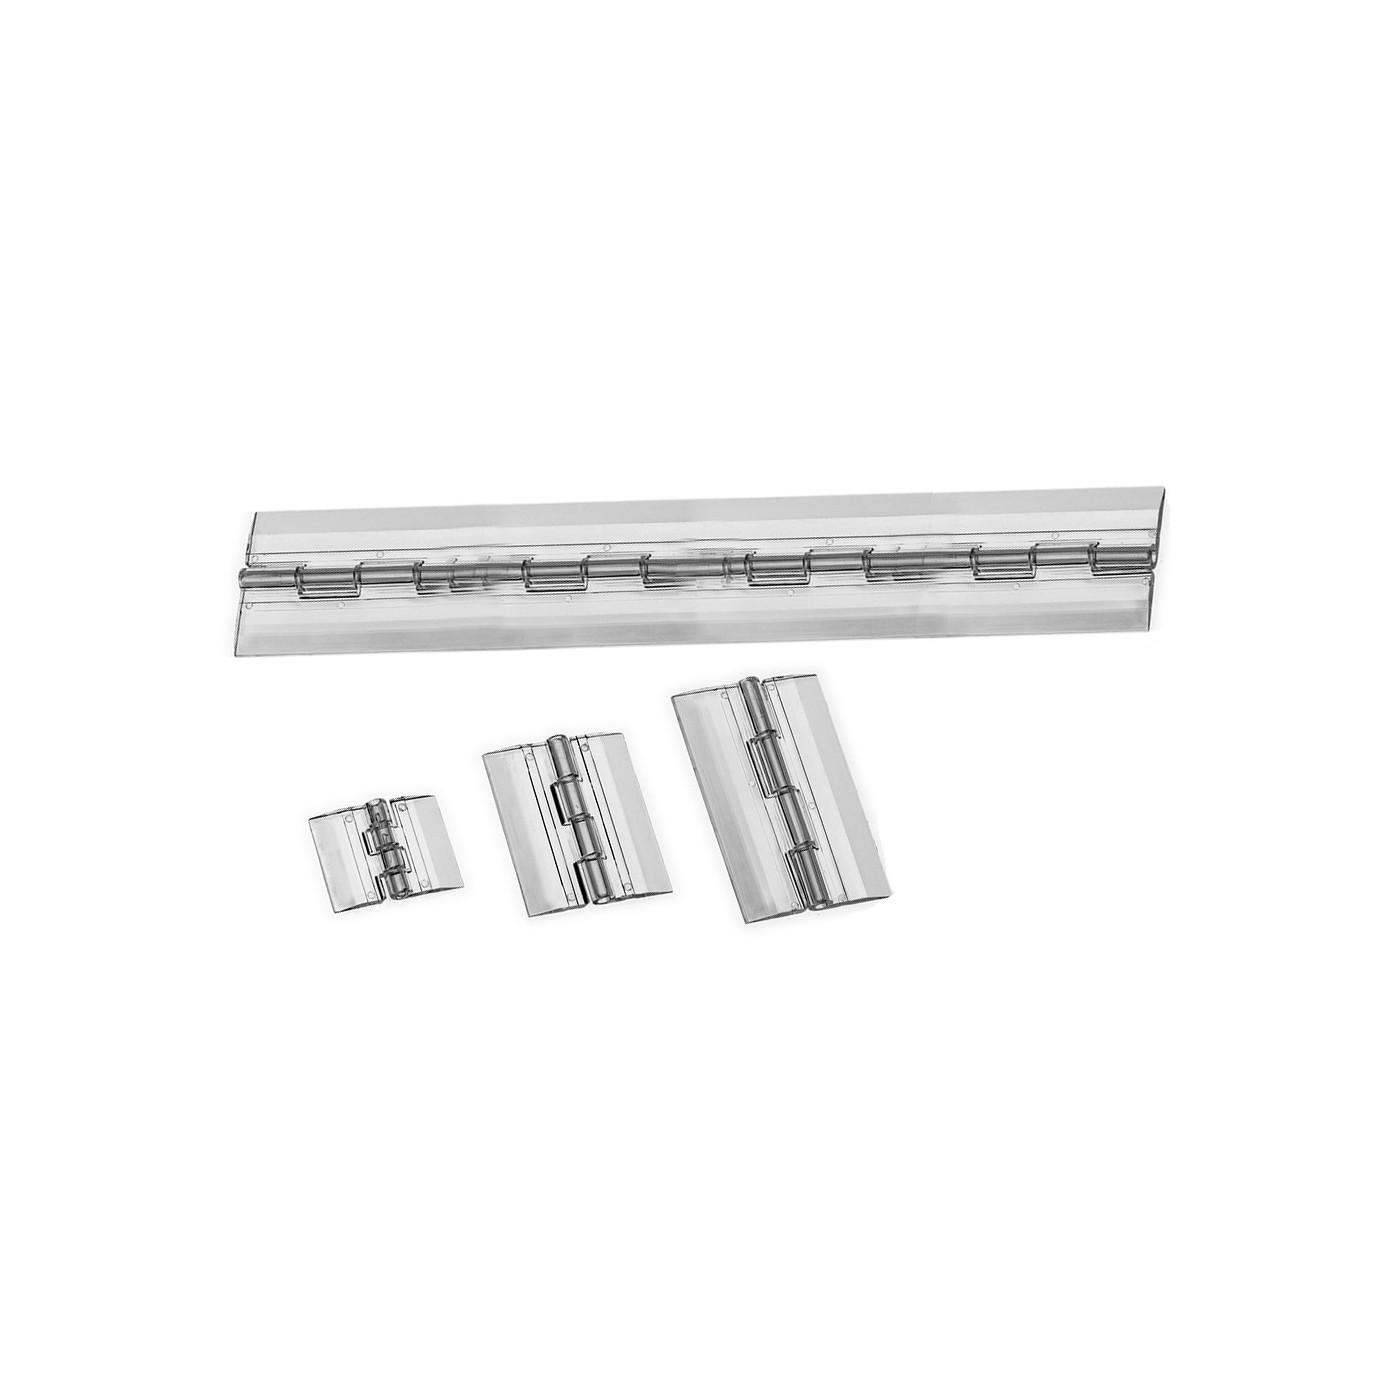 Set van 25 plastic scharnieren, transparant, 45x35 mm  - 1